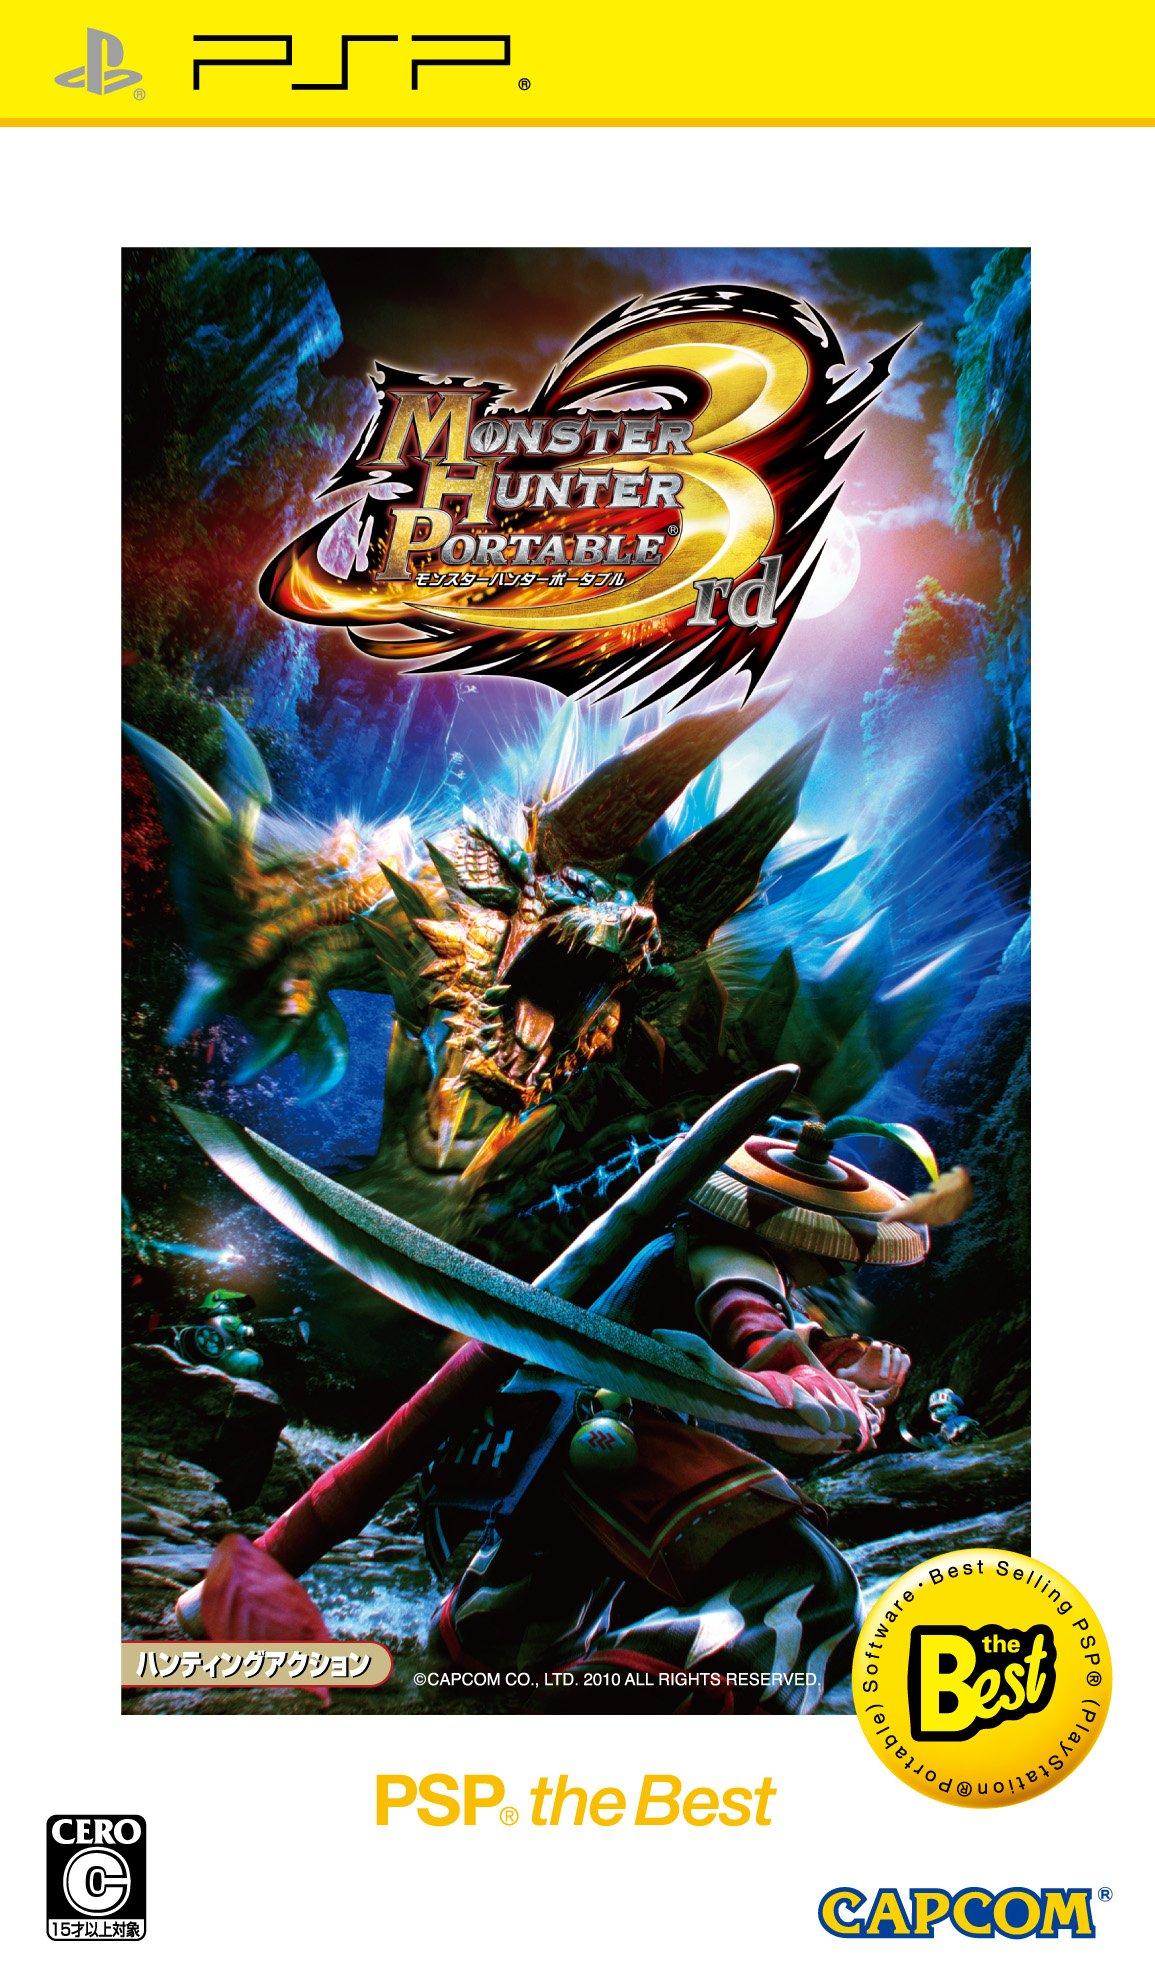 Monster Hunter Portable 3rd for PSP (Japanese Language Import)